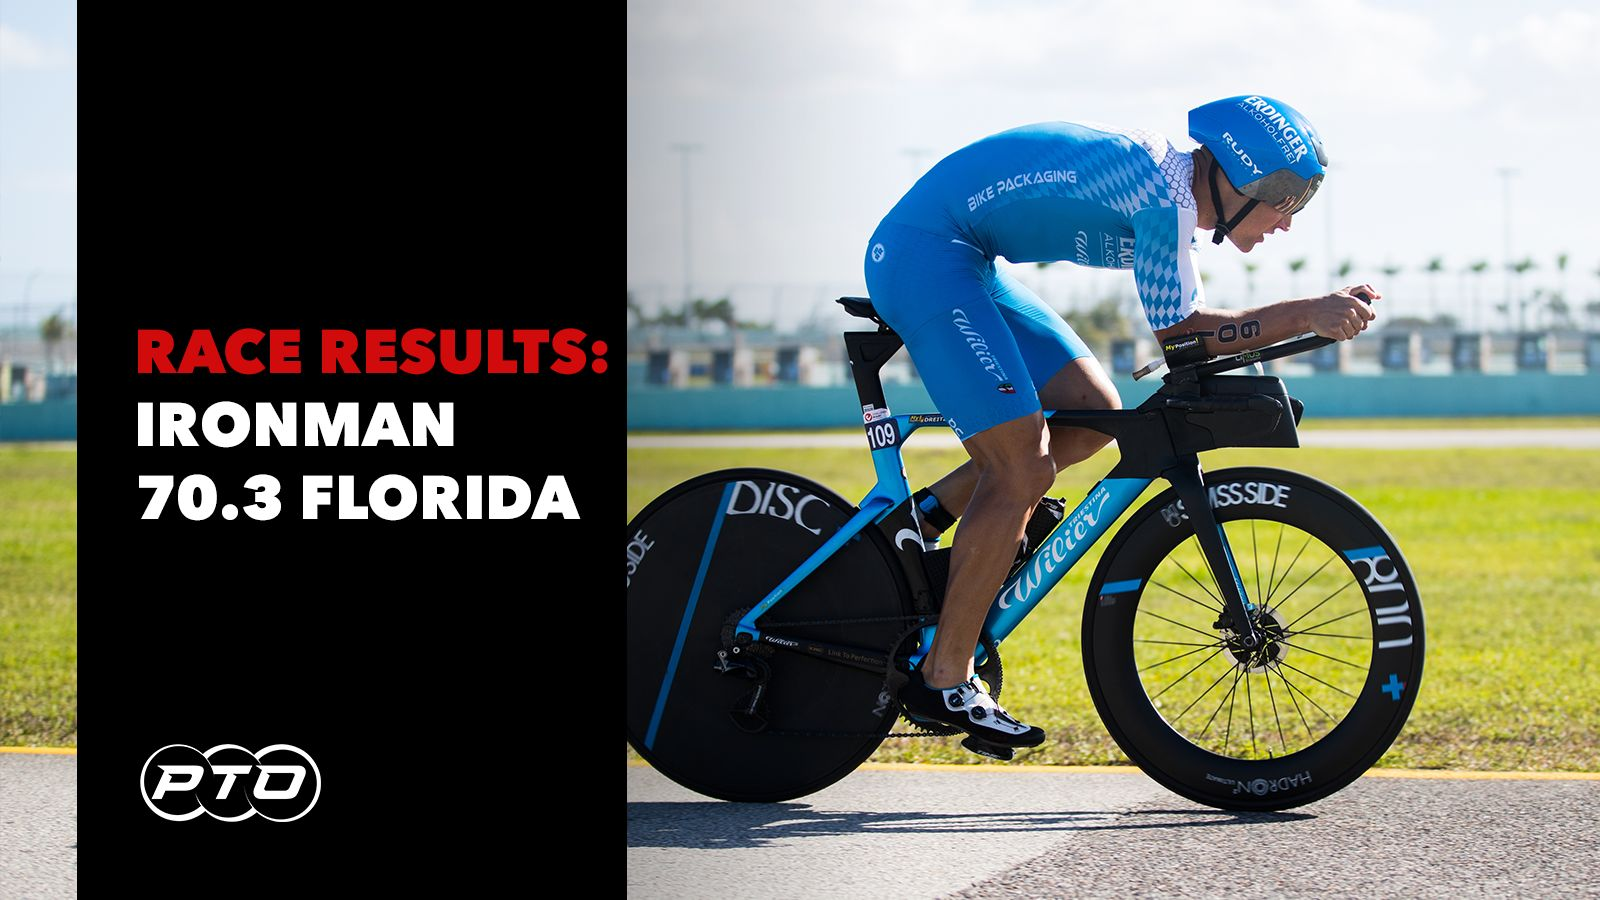 Race Results: Ironman 70.3 Florida